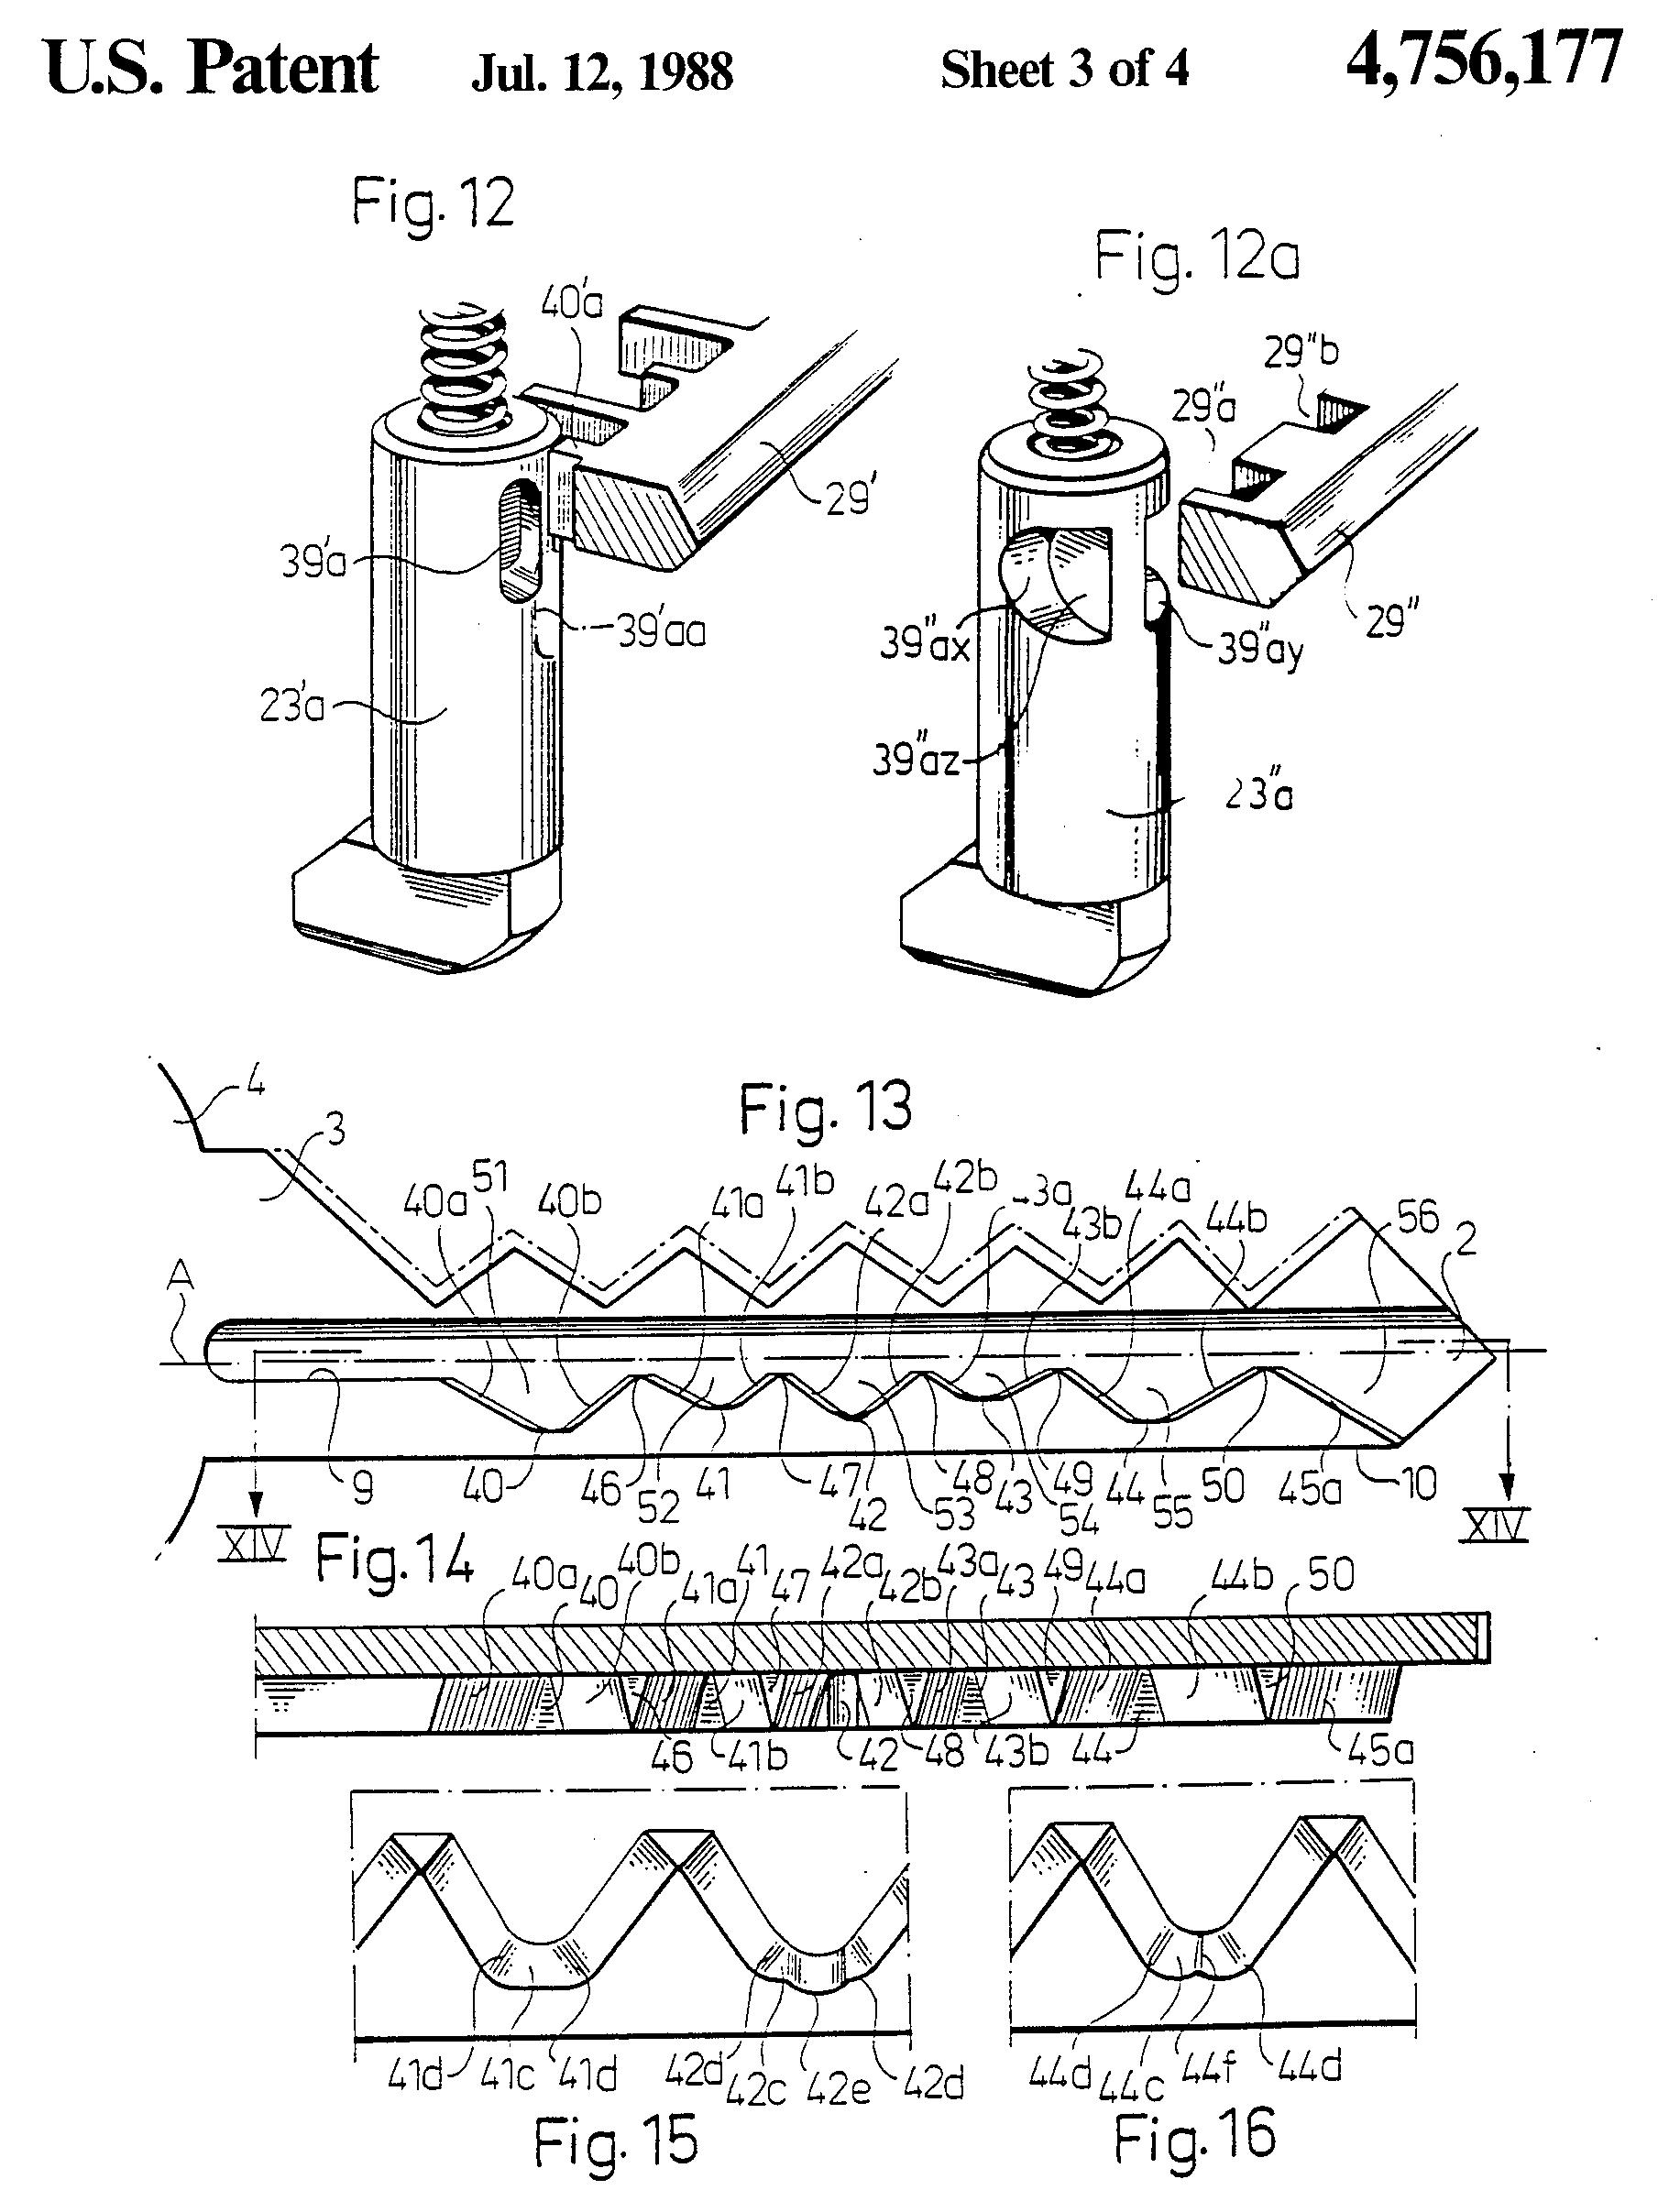 File Schlage Primus Design Us Patent July